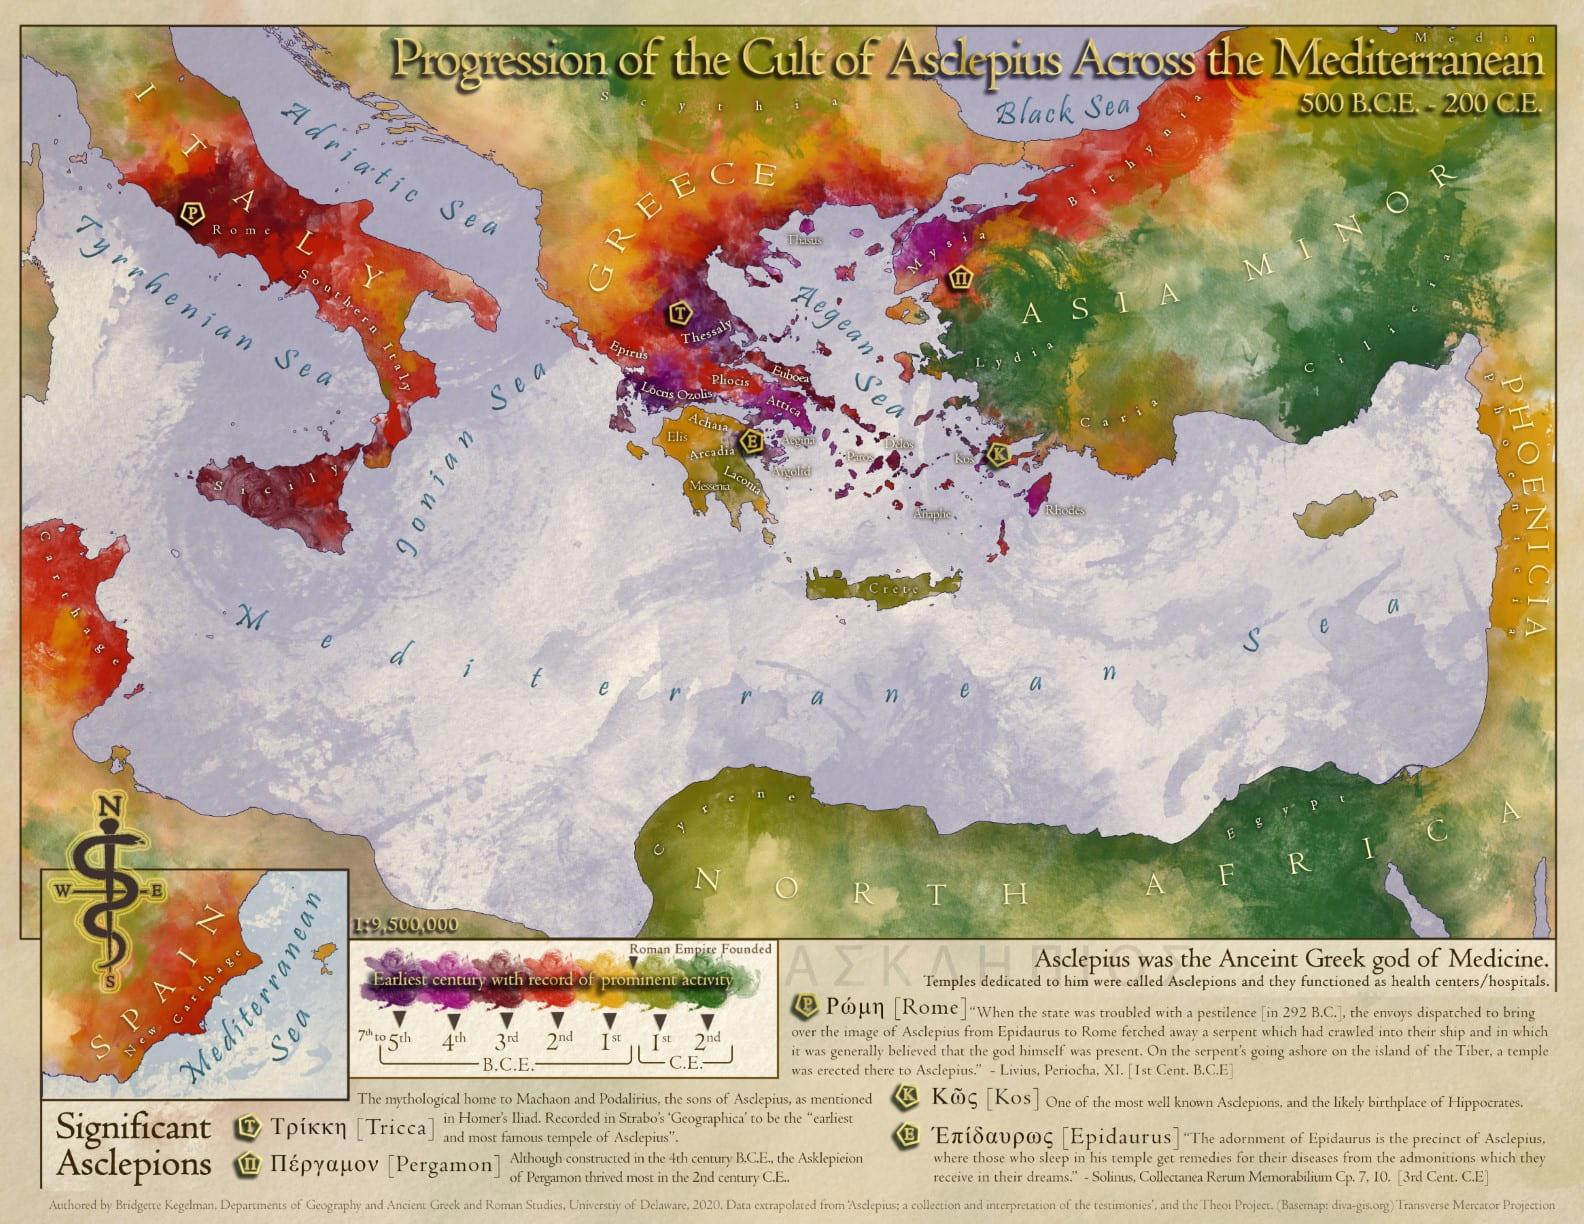 2020 Winner Map from Bridgette Kegelman - Progression of the Cult of Asclepius across the Mediterranean 500 B.C.E. – 200 C.E.